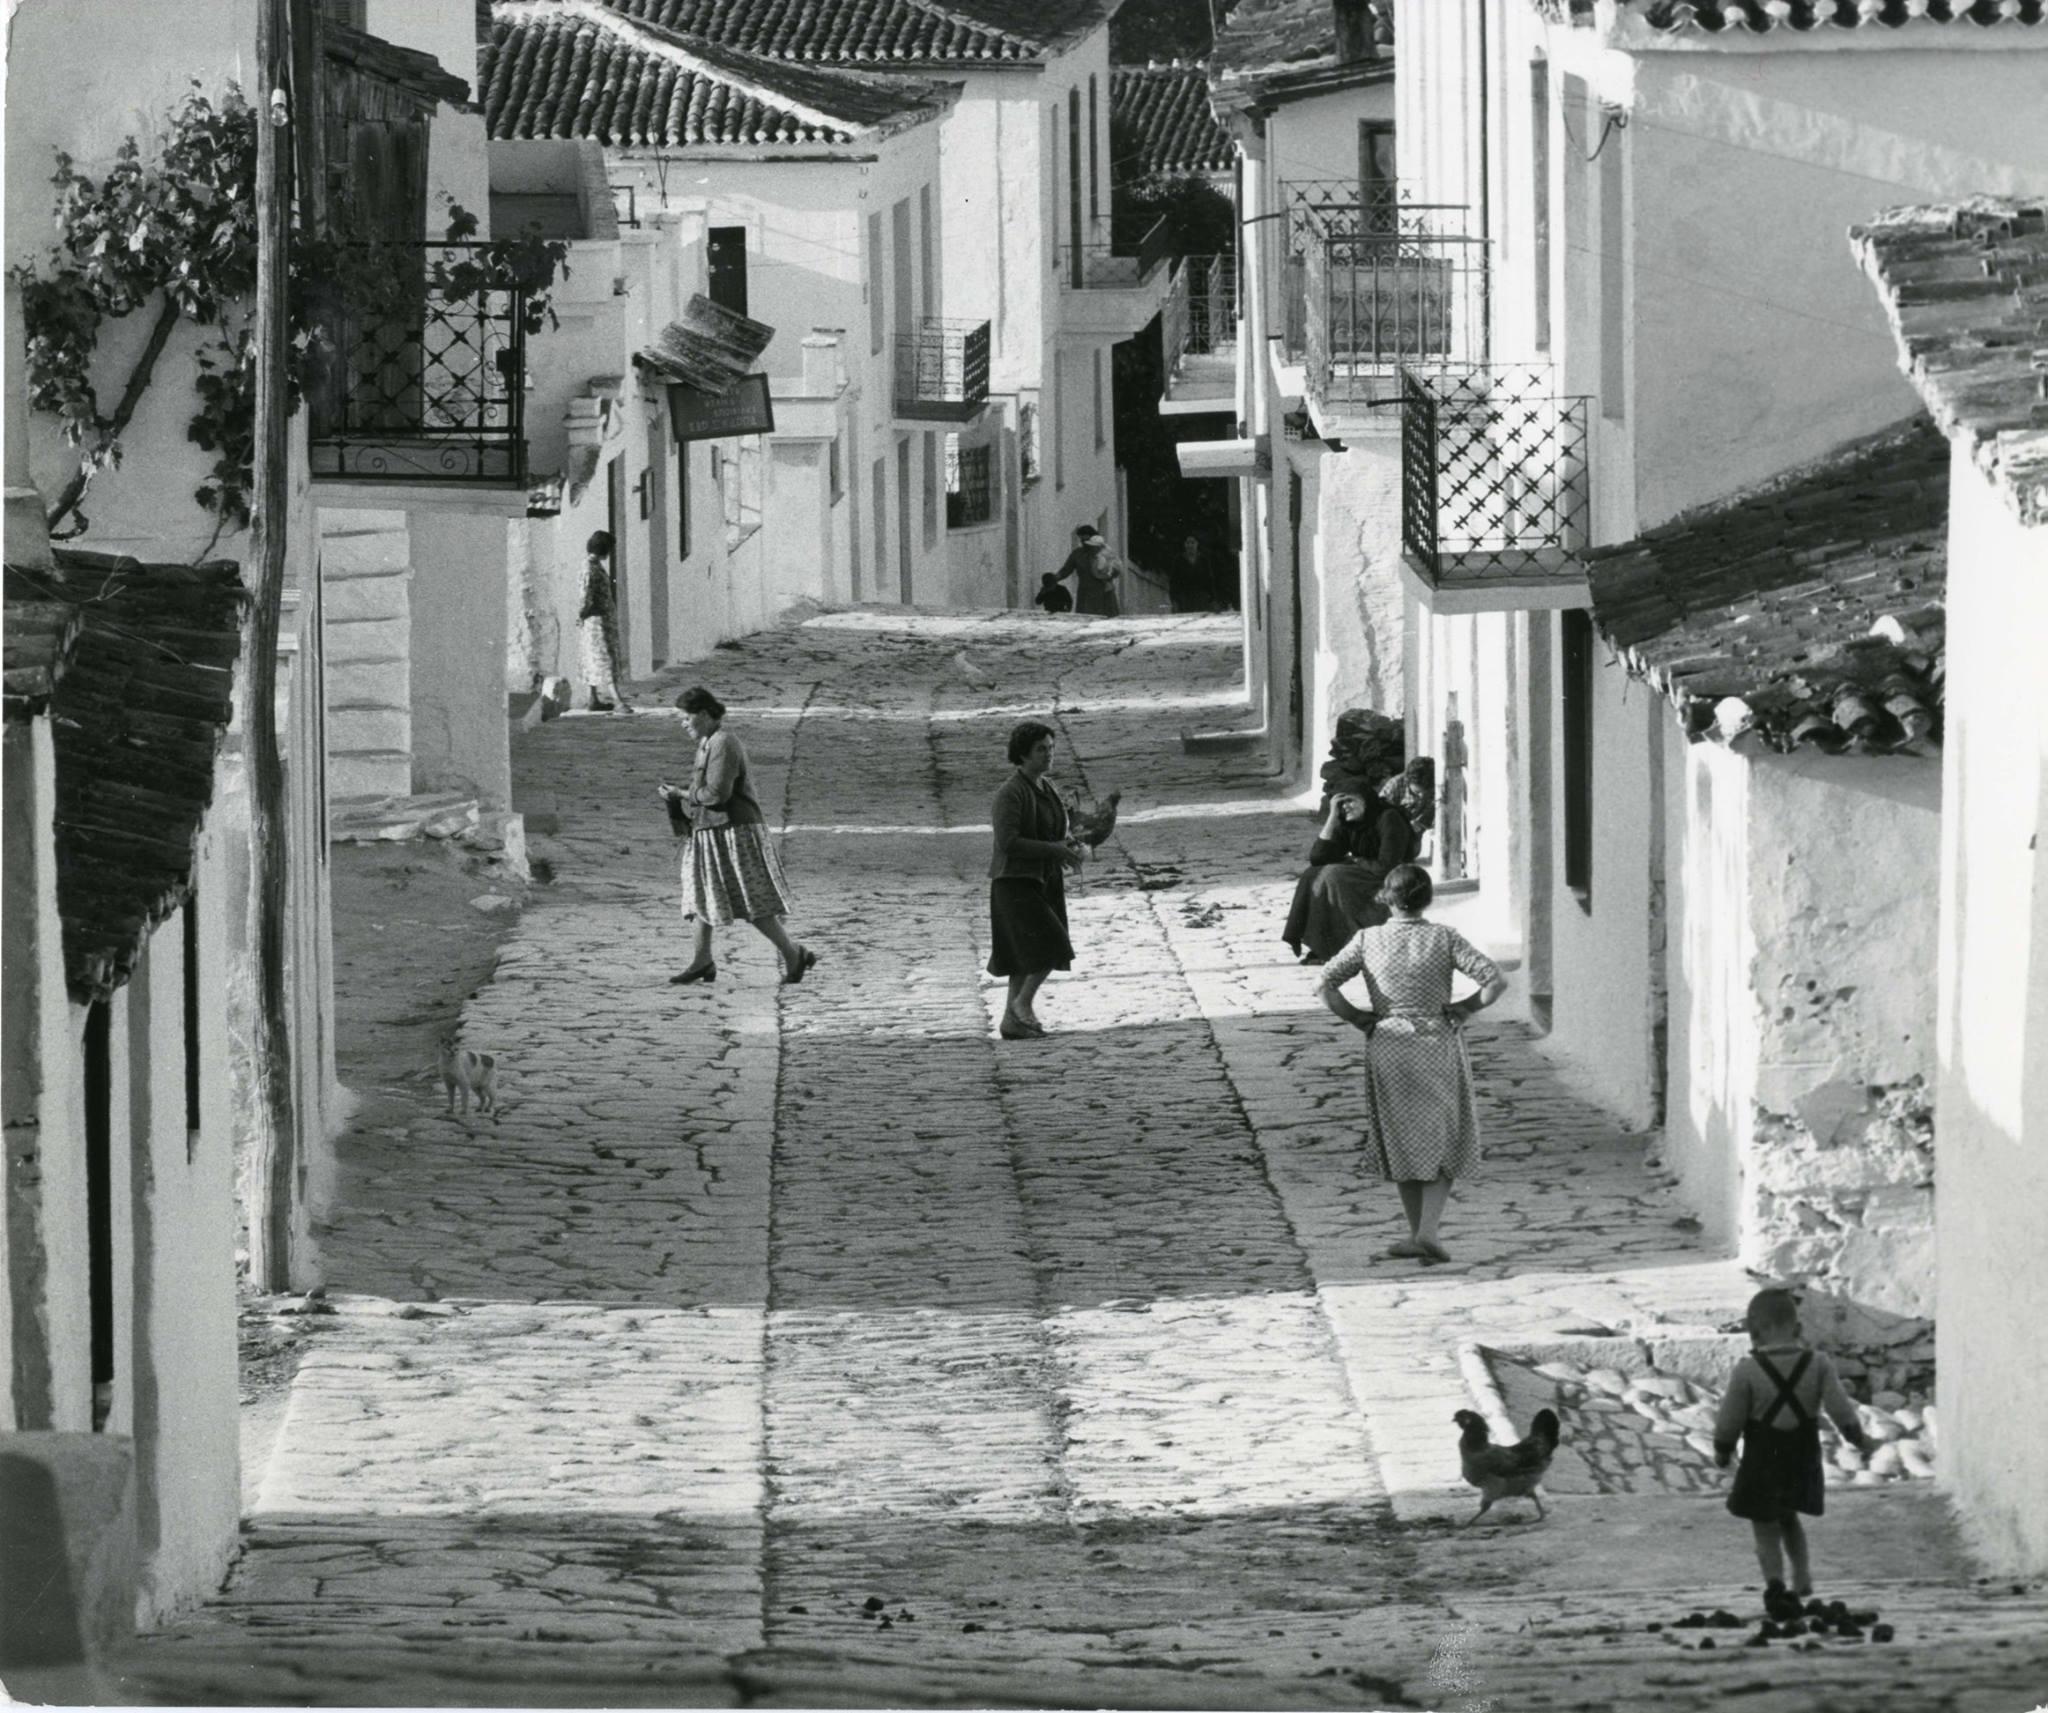 Wolf Suschitzky «Ταξίδι στην Ελλάδα του '60»